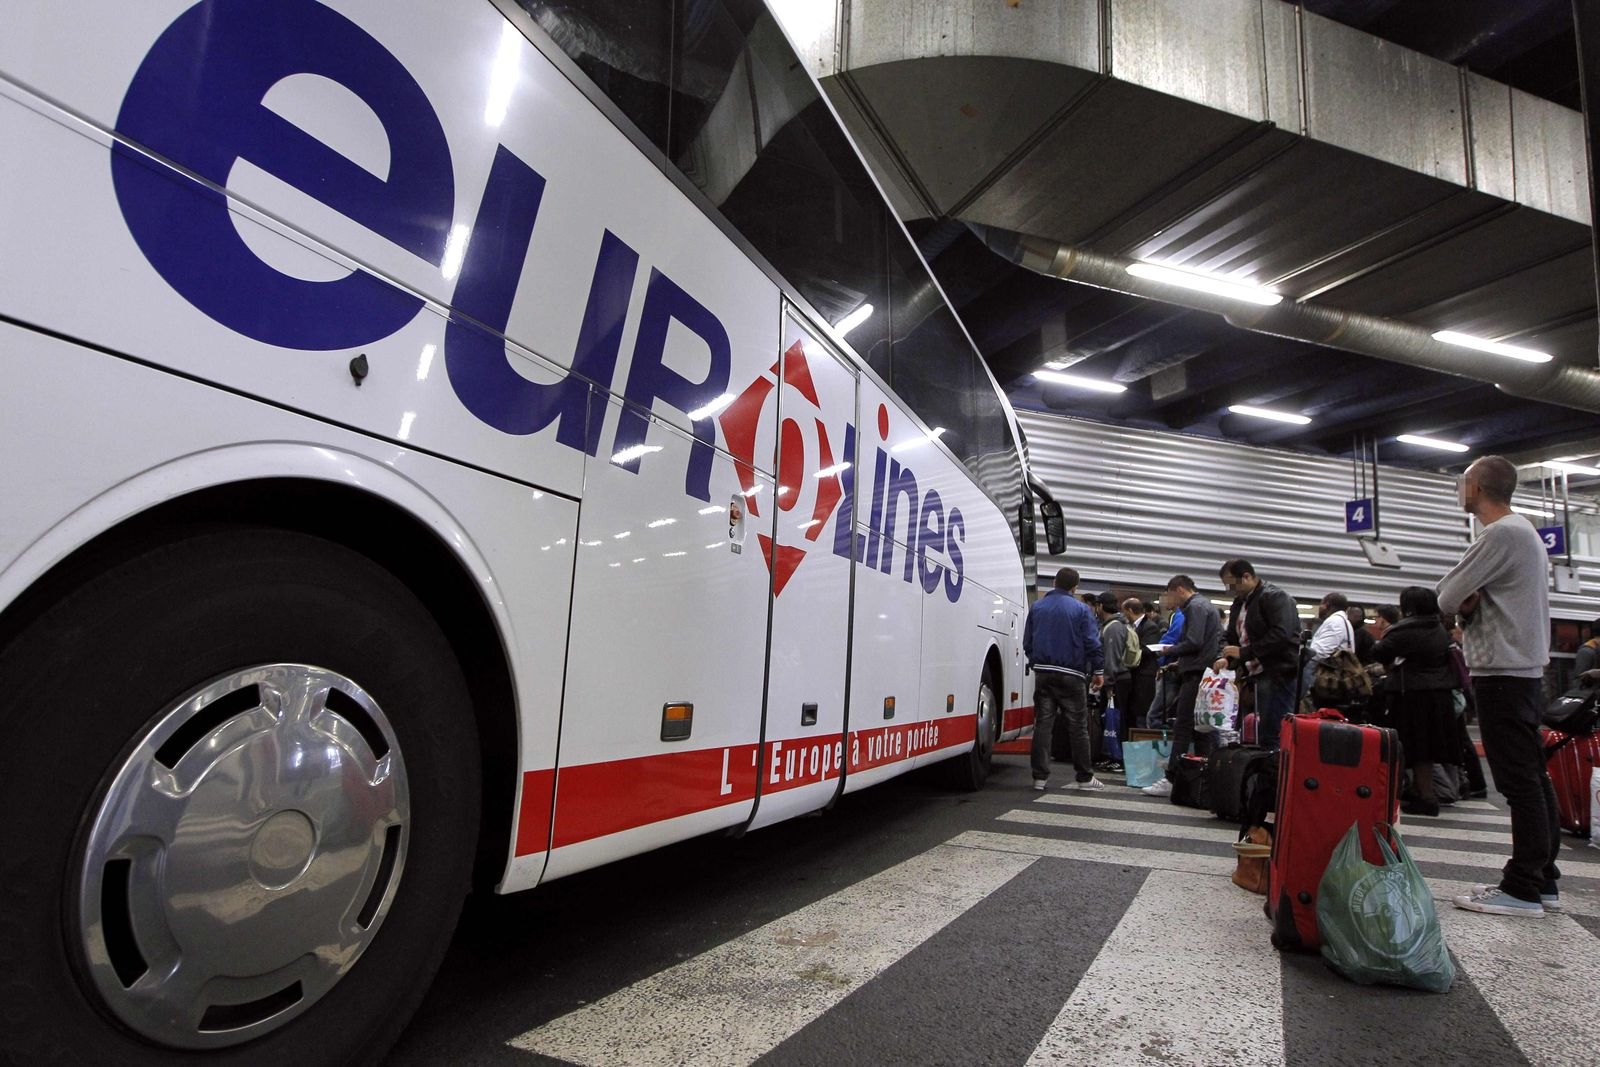 Flixbus / Eurolines